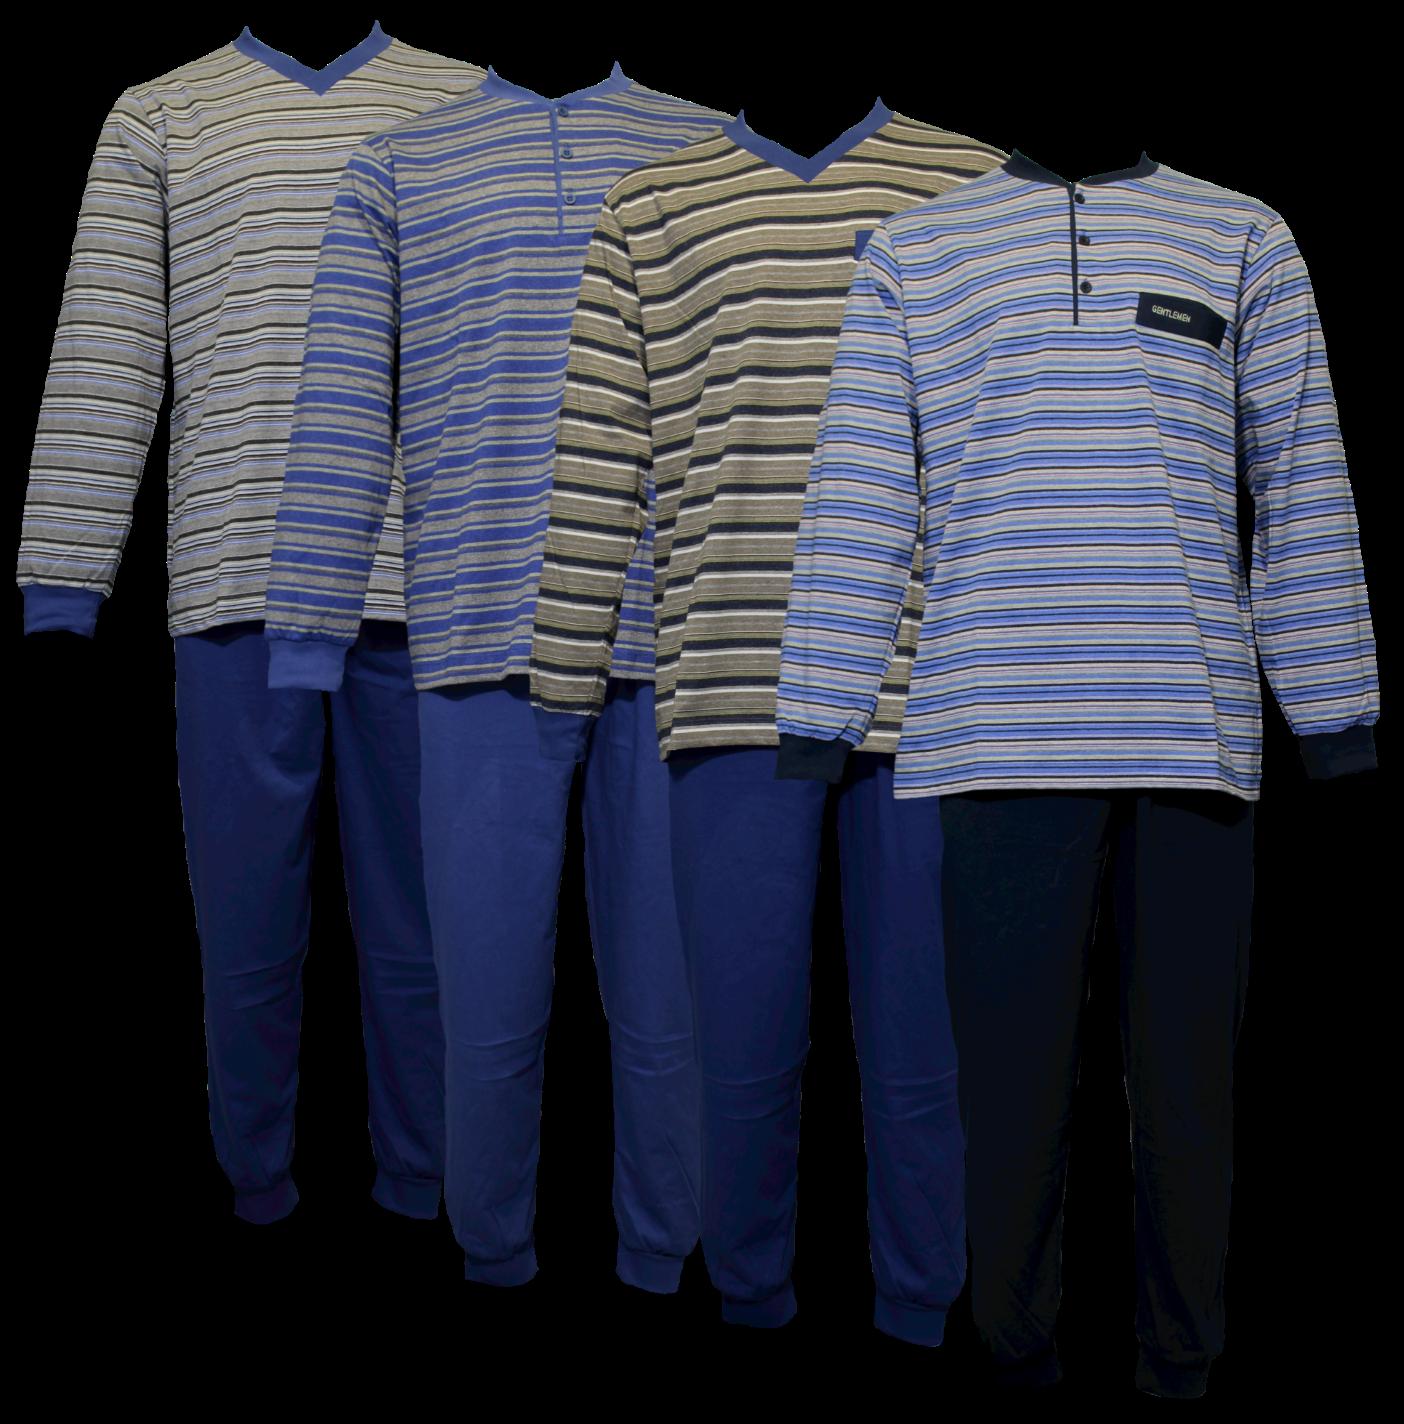 Heren pyjama tricot/jersey